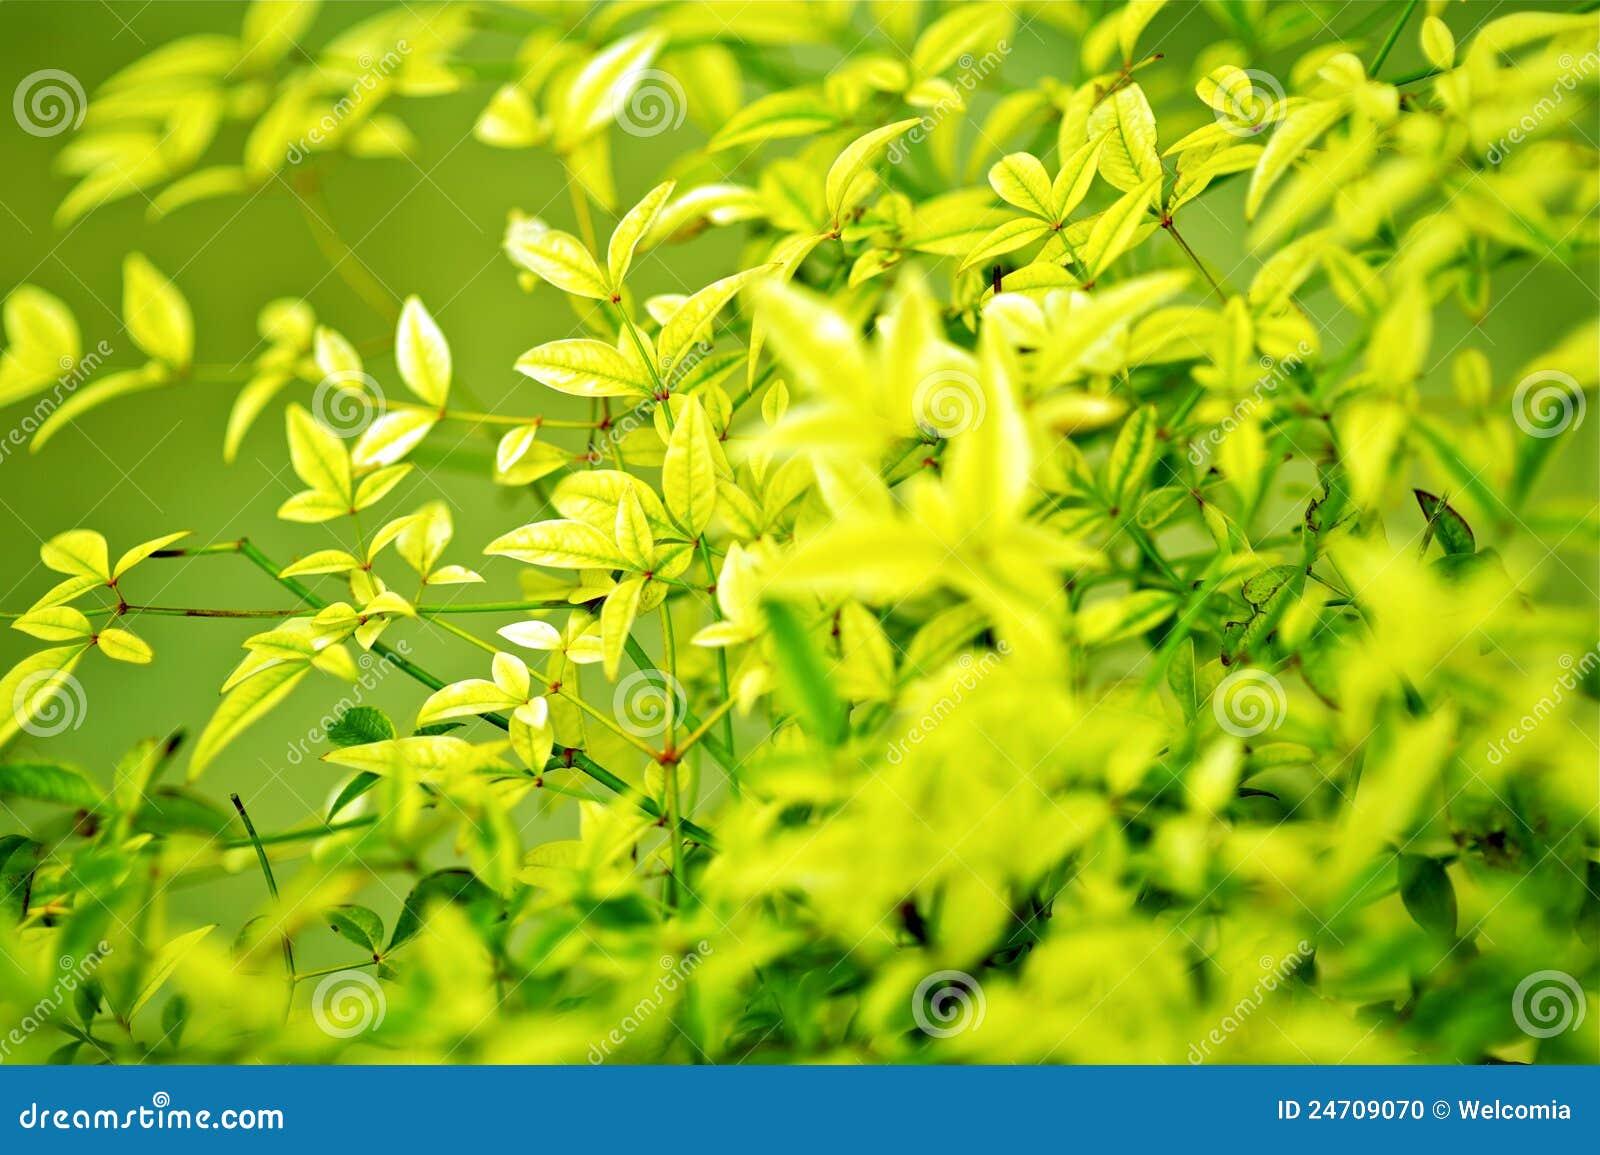 背景绿色leafes